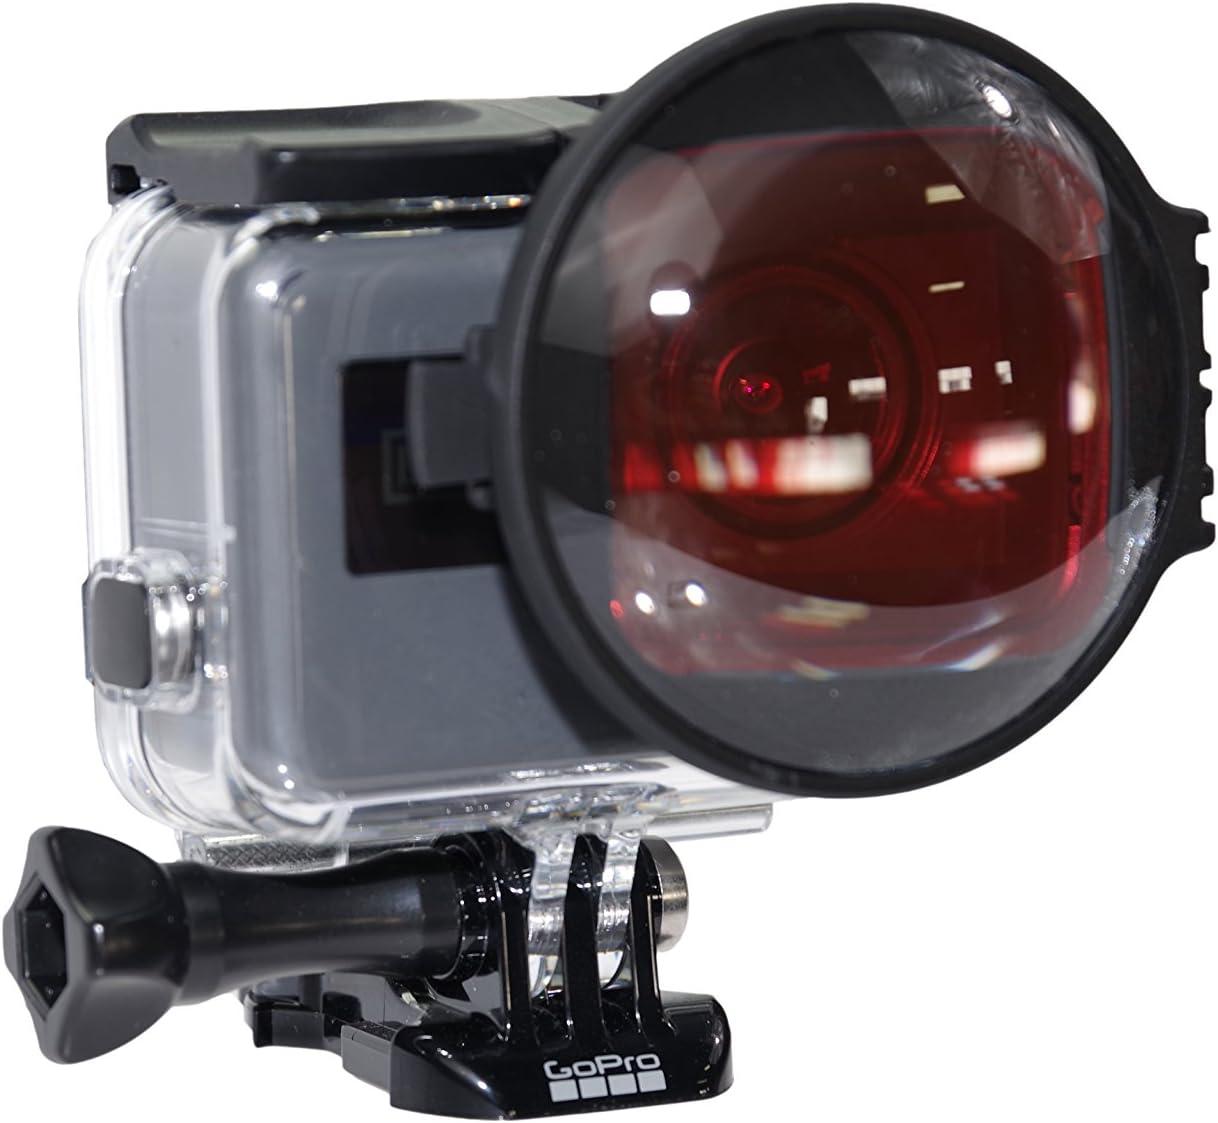 Pola rpro conmutaci/ón hblade5/ /Filtro Combinado para GoPro Hero 5